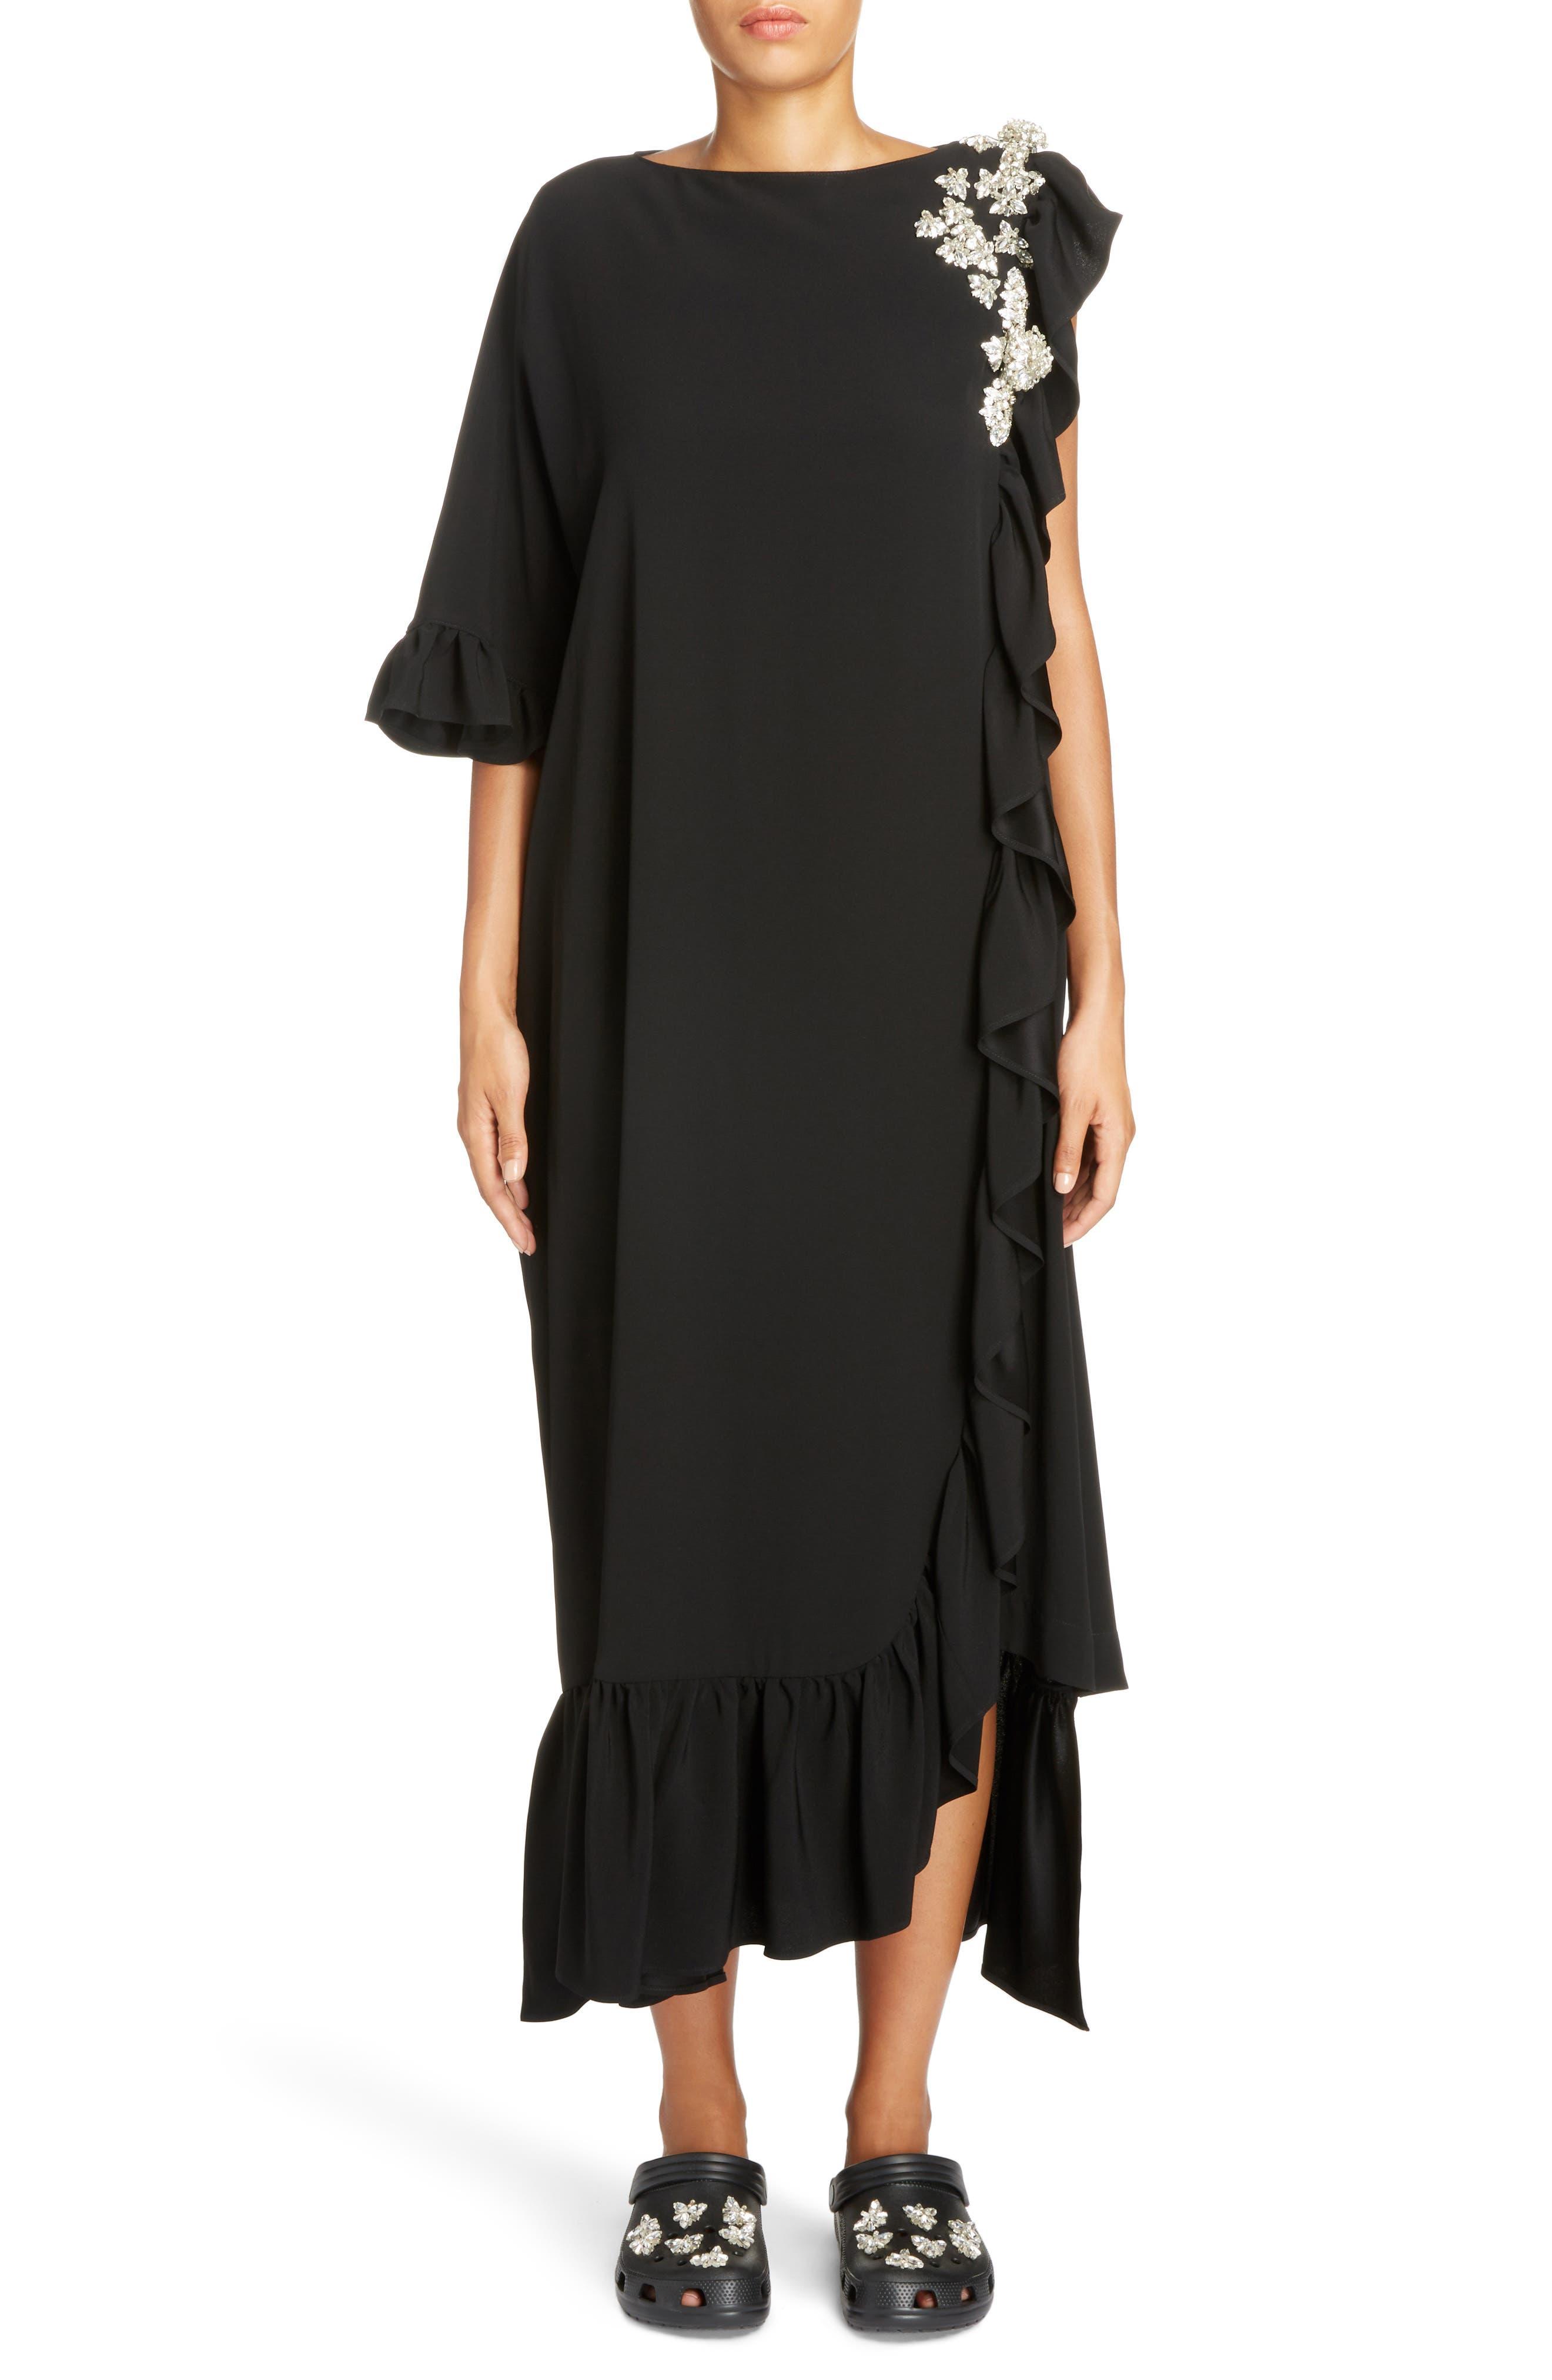 Crystal Embellished Frill Maxi Dress,                             Main thumbnail 1, color,                             Black